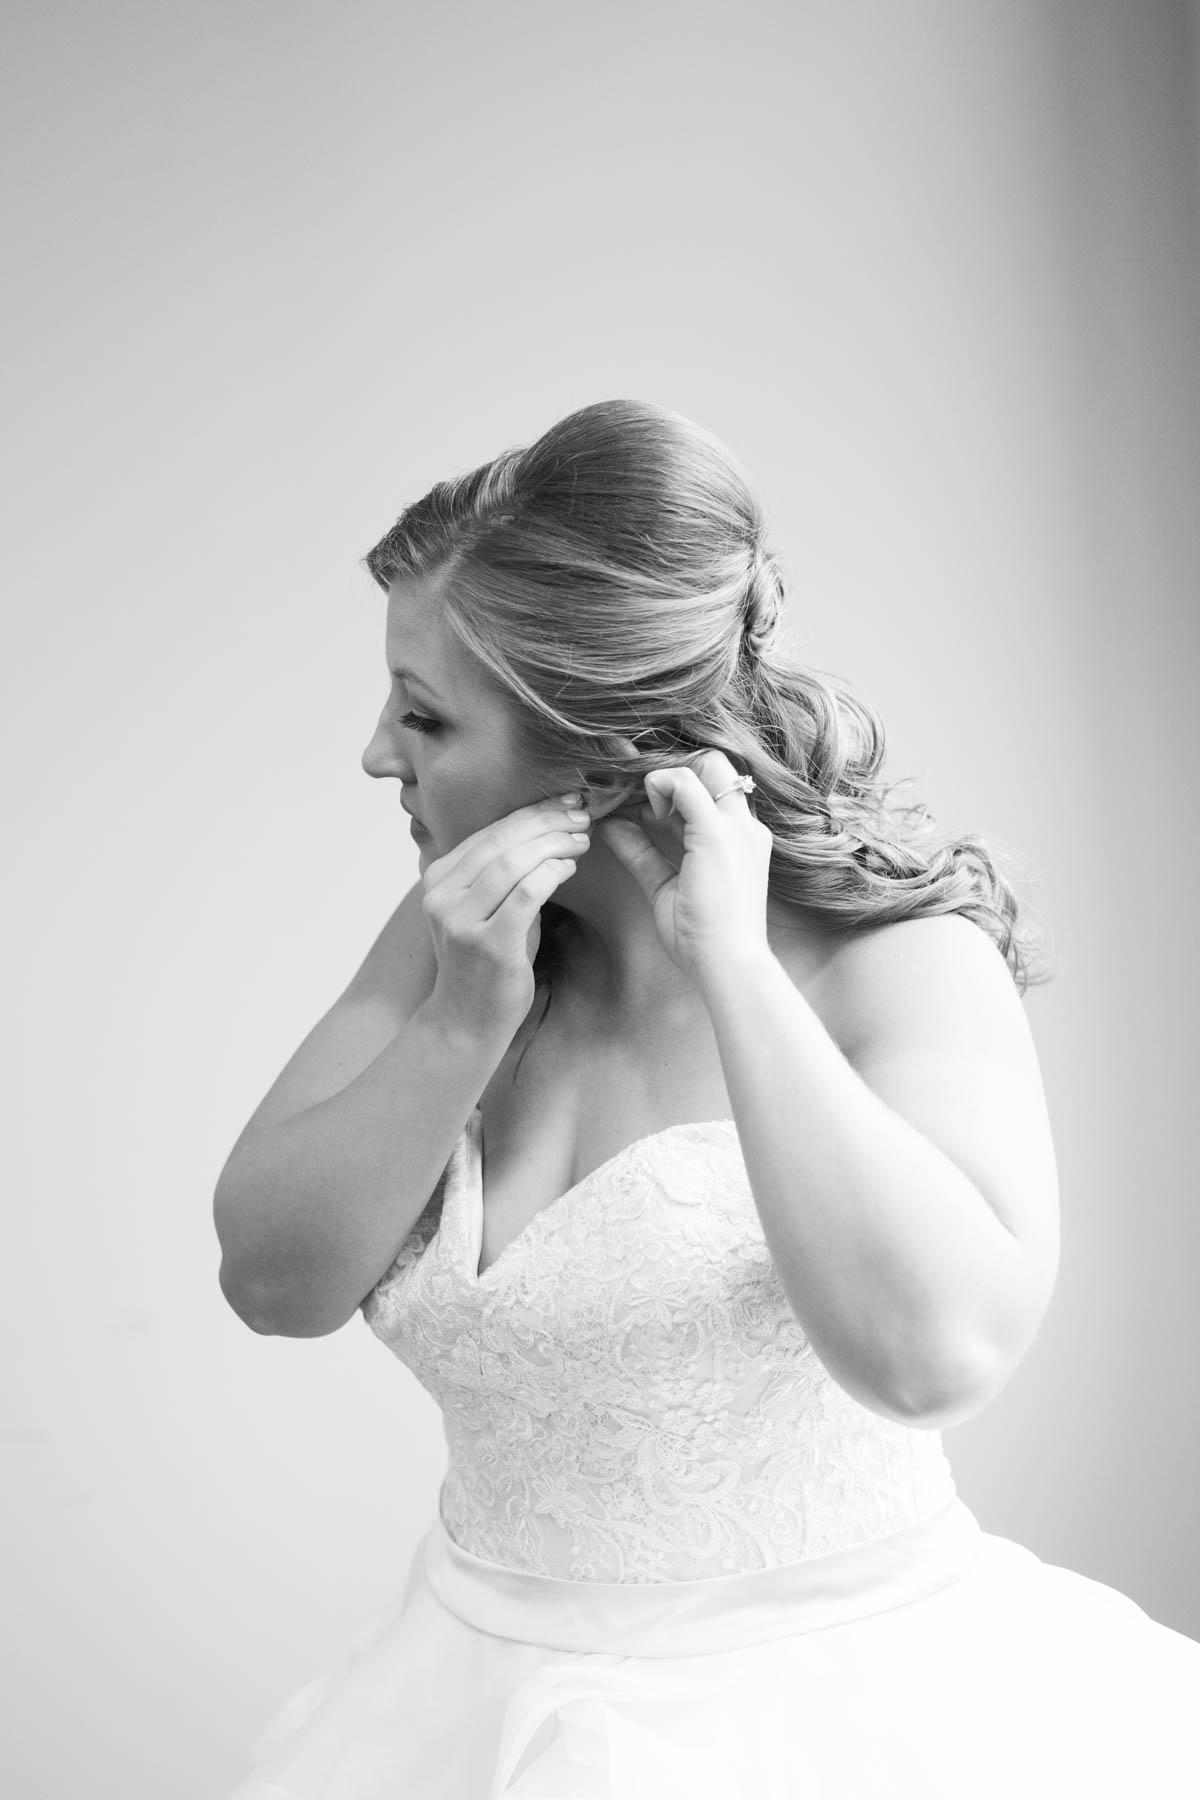 shotbychelsea_blog_wedding-8.jpg